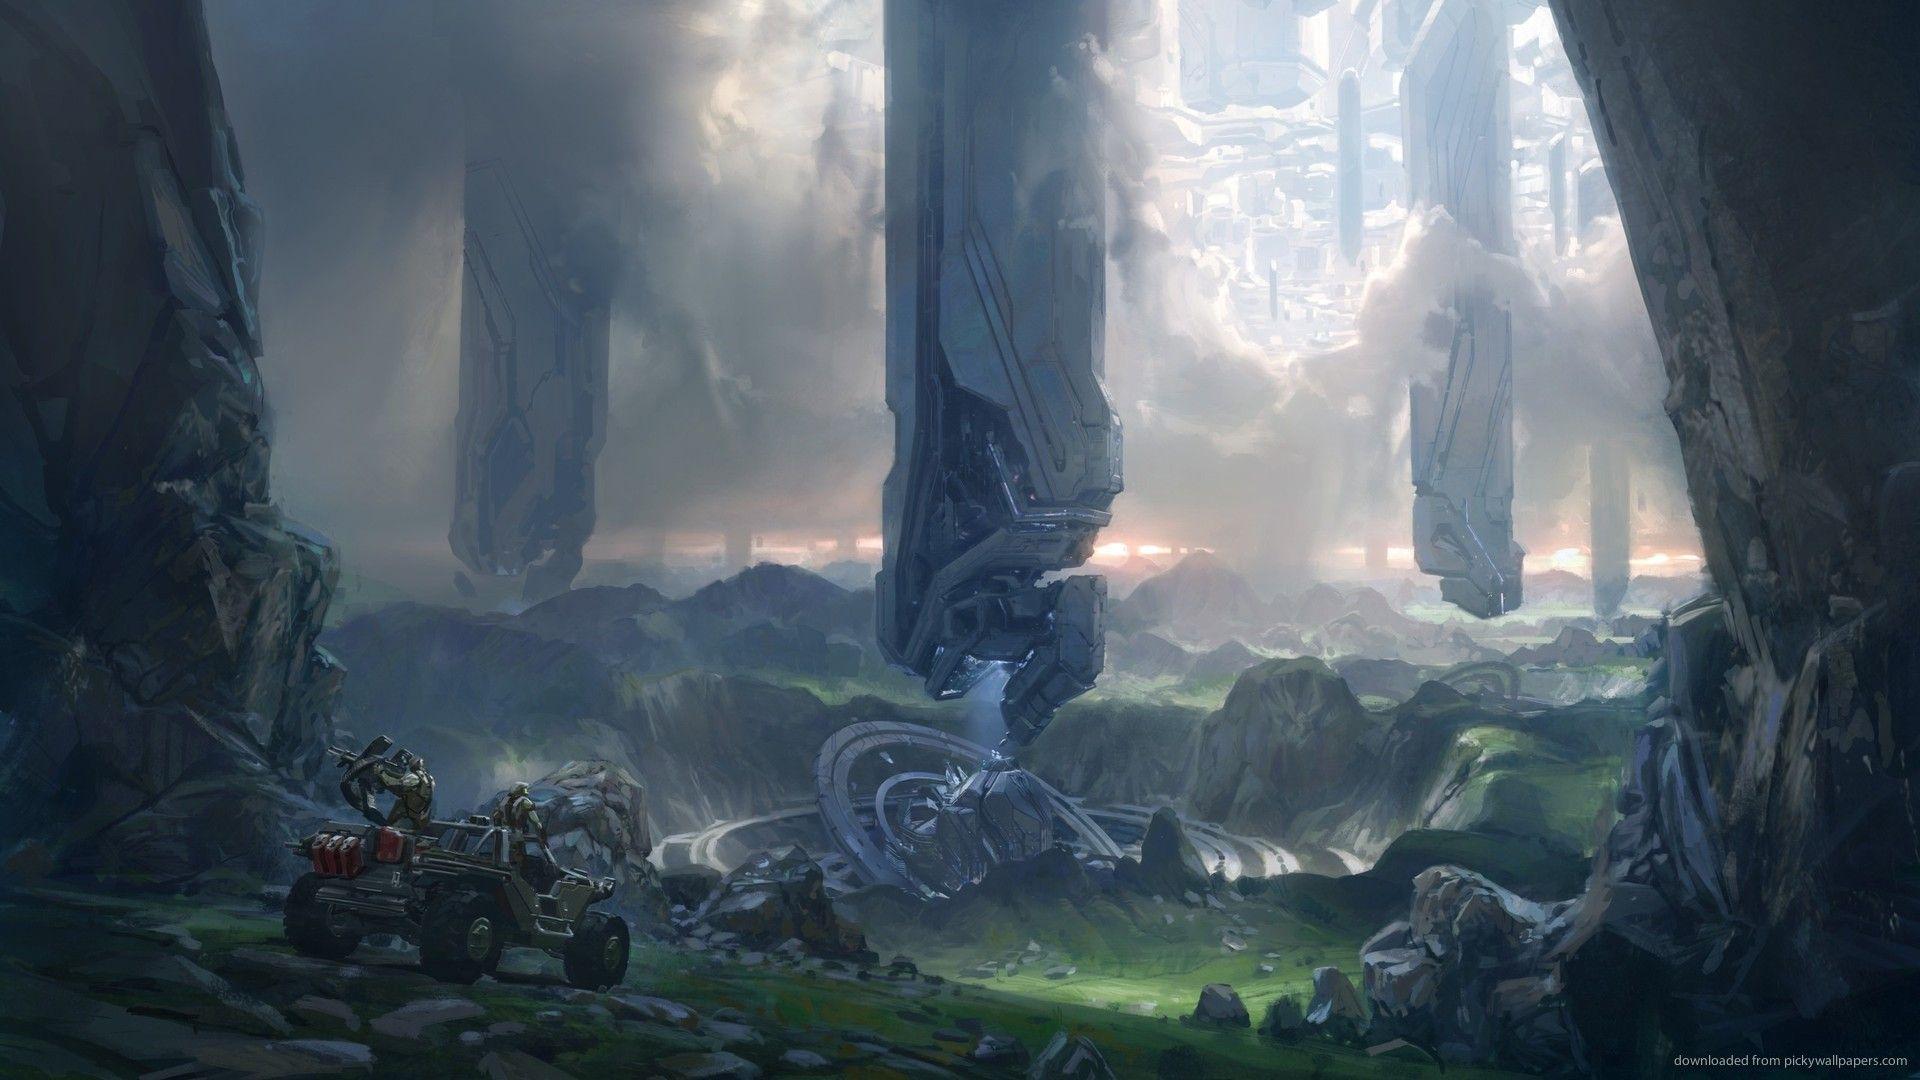 Halo 4 Concept Art Wallpaper Sci Fi Concept Art Environment Concept Art Game Concept Art